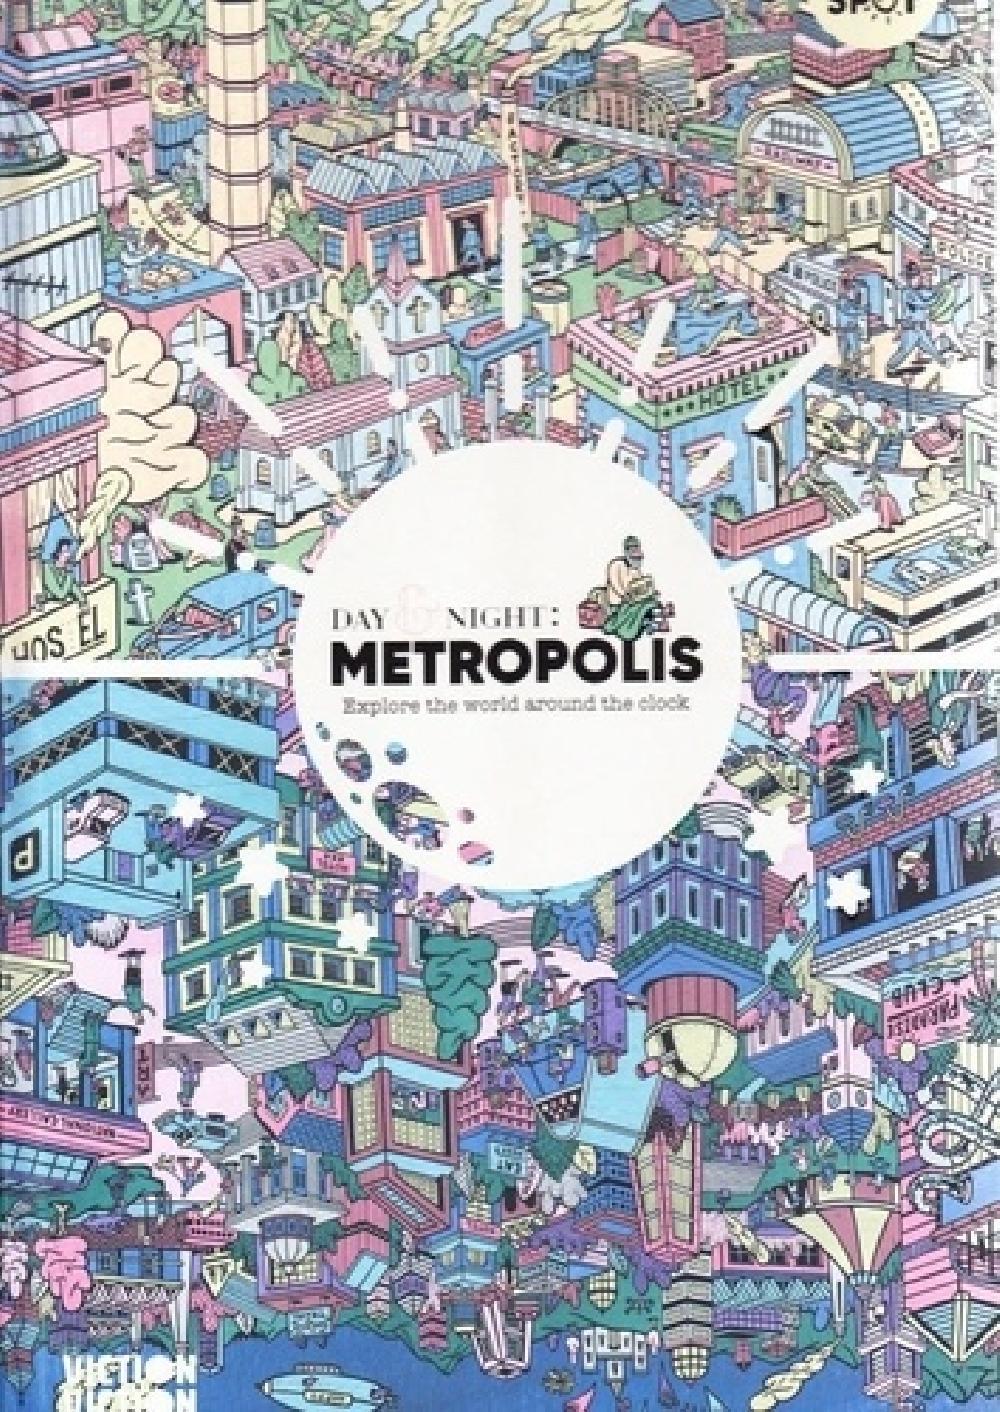 Day & night metropolis explore the world around-the-clock